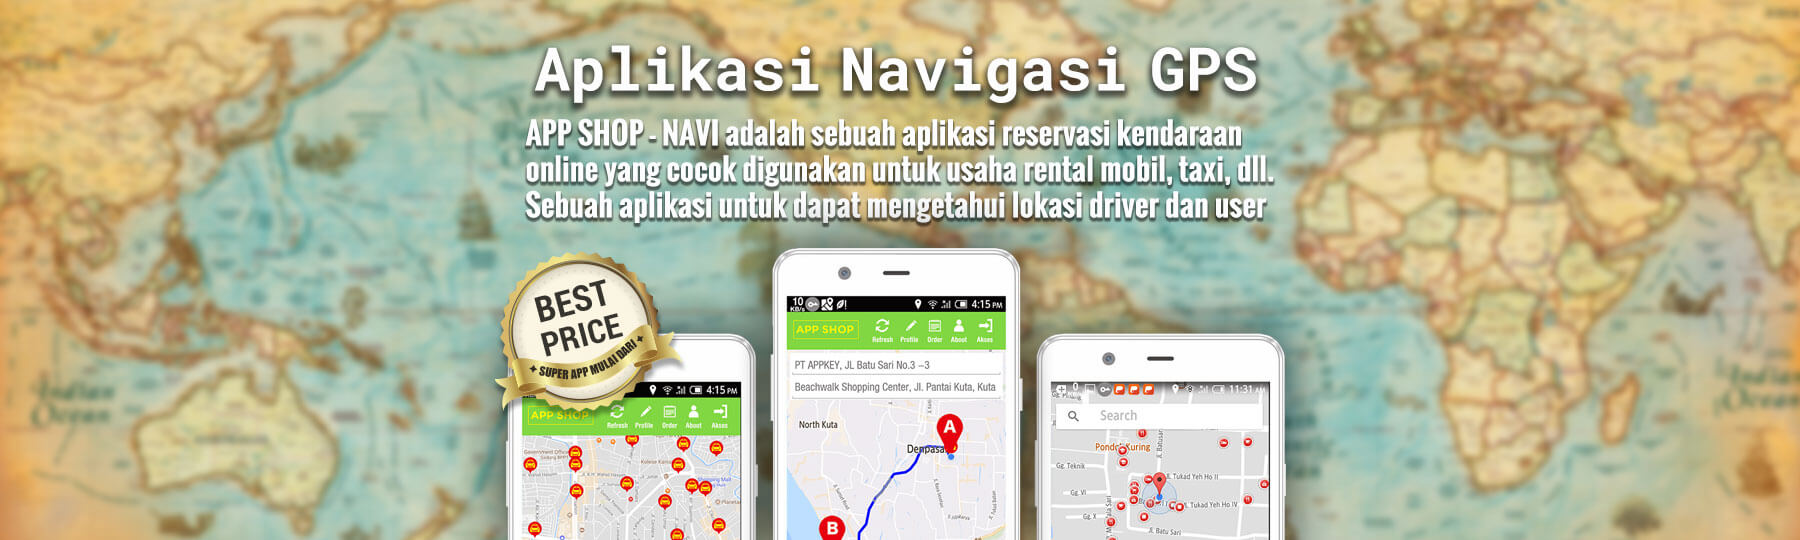 Aplikasi Navigasi GPS